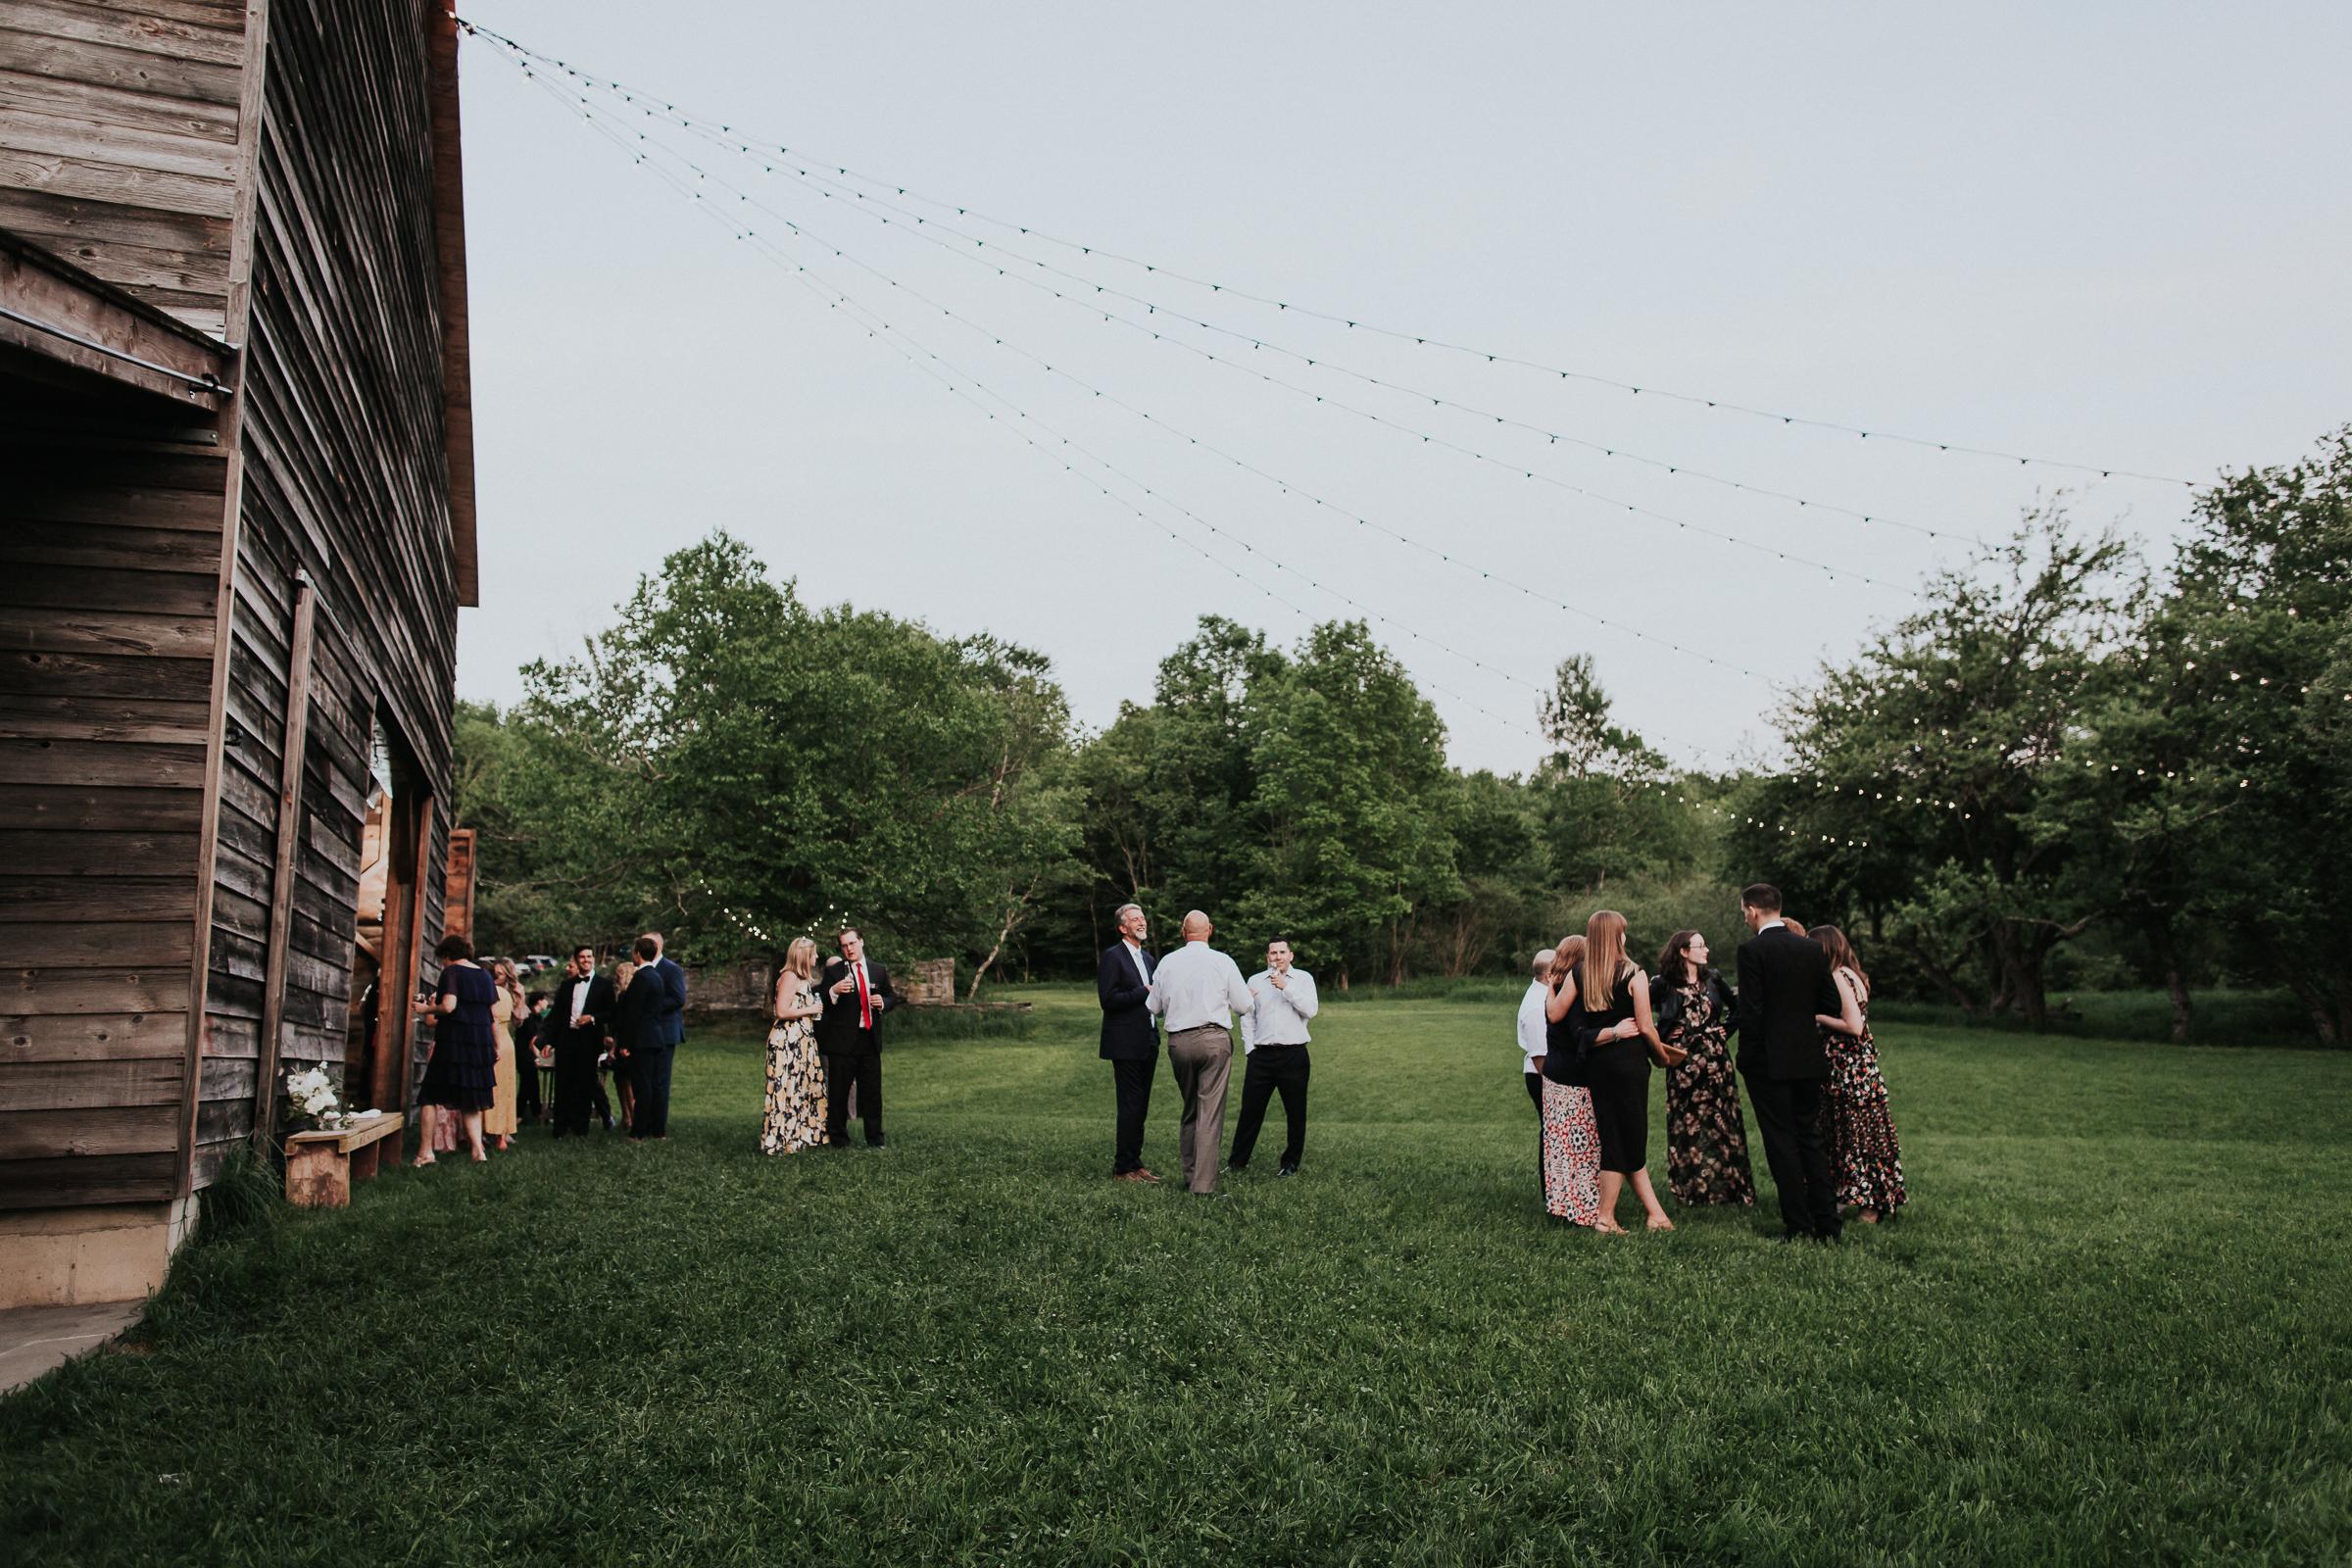 Handsome-Hollow-Long-Eddy-Catskills-New-York-Fine-Art-Documentary-Wedding-Photographer-126.jpg